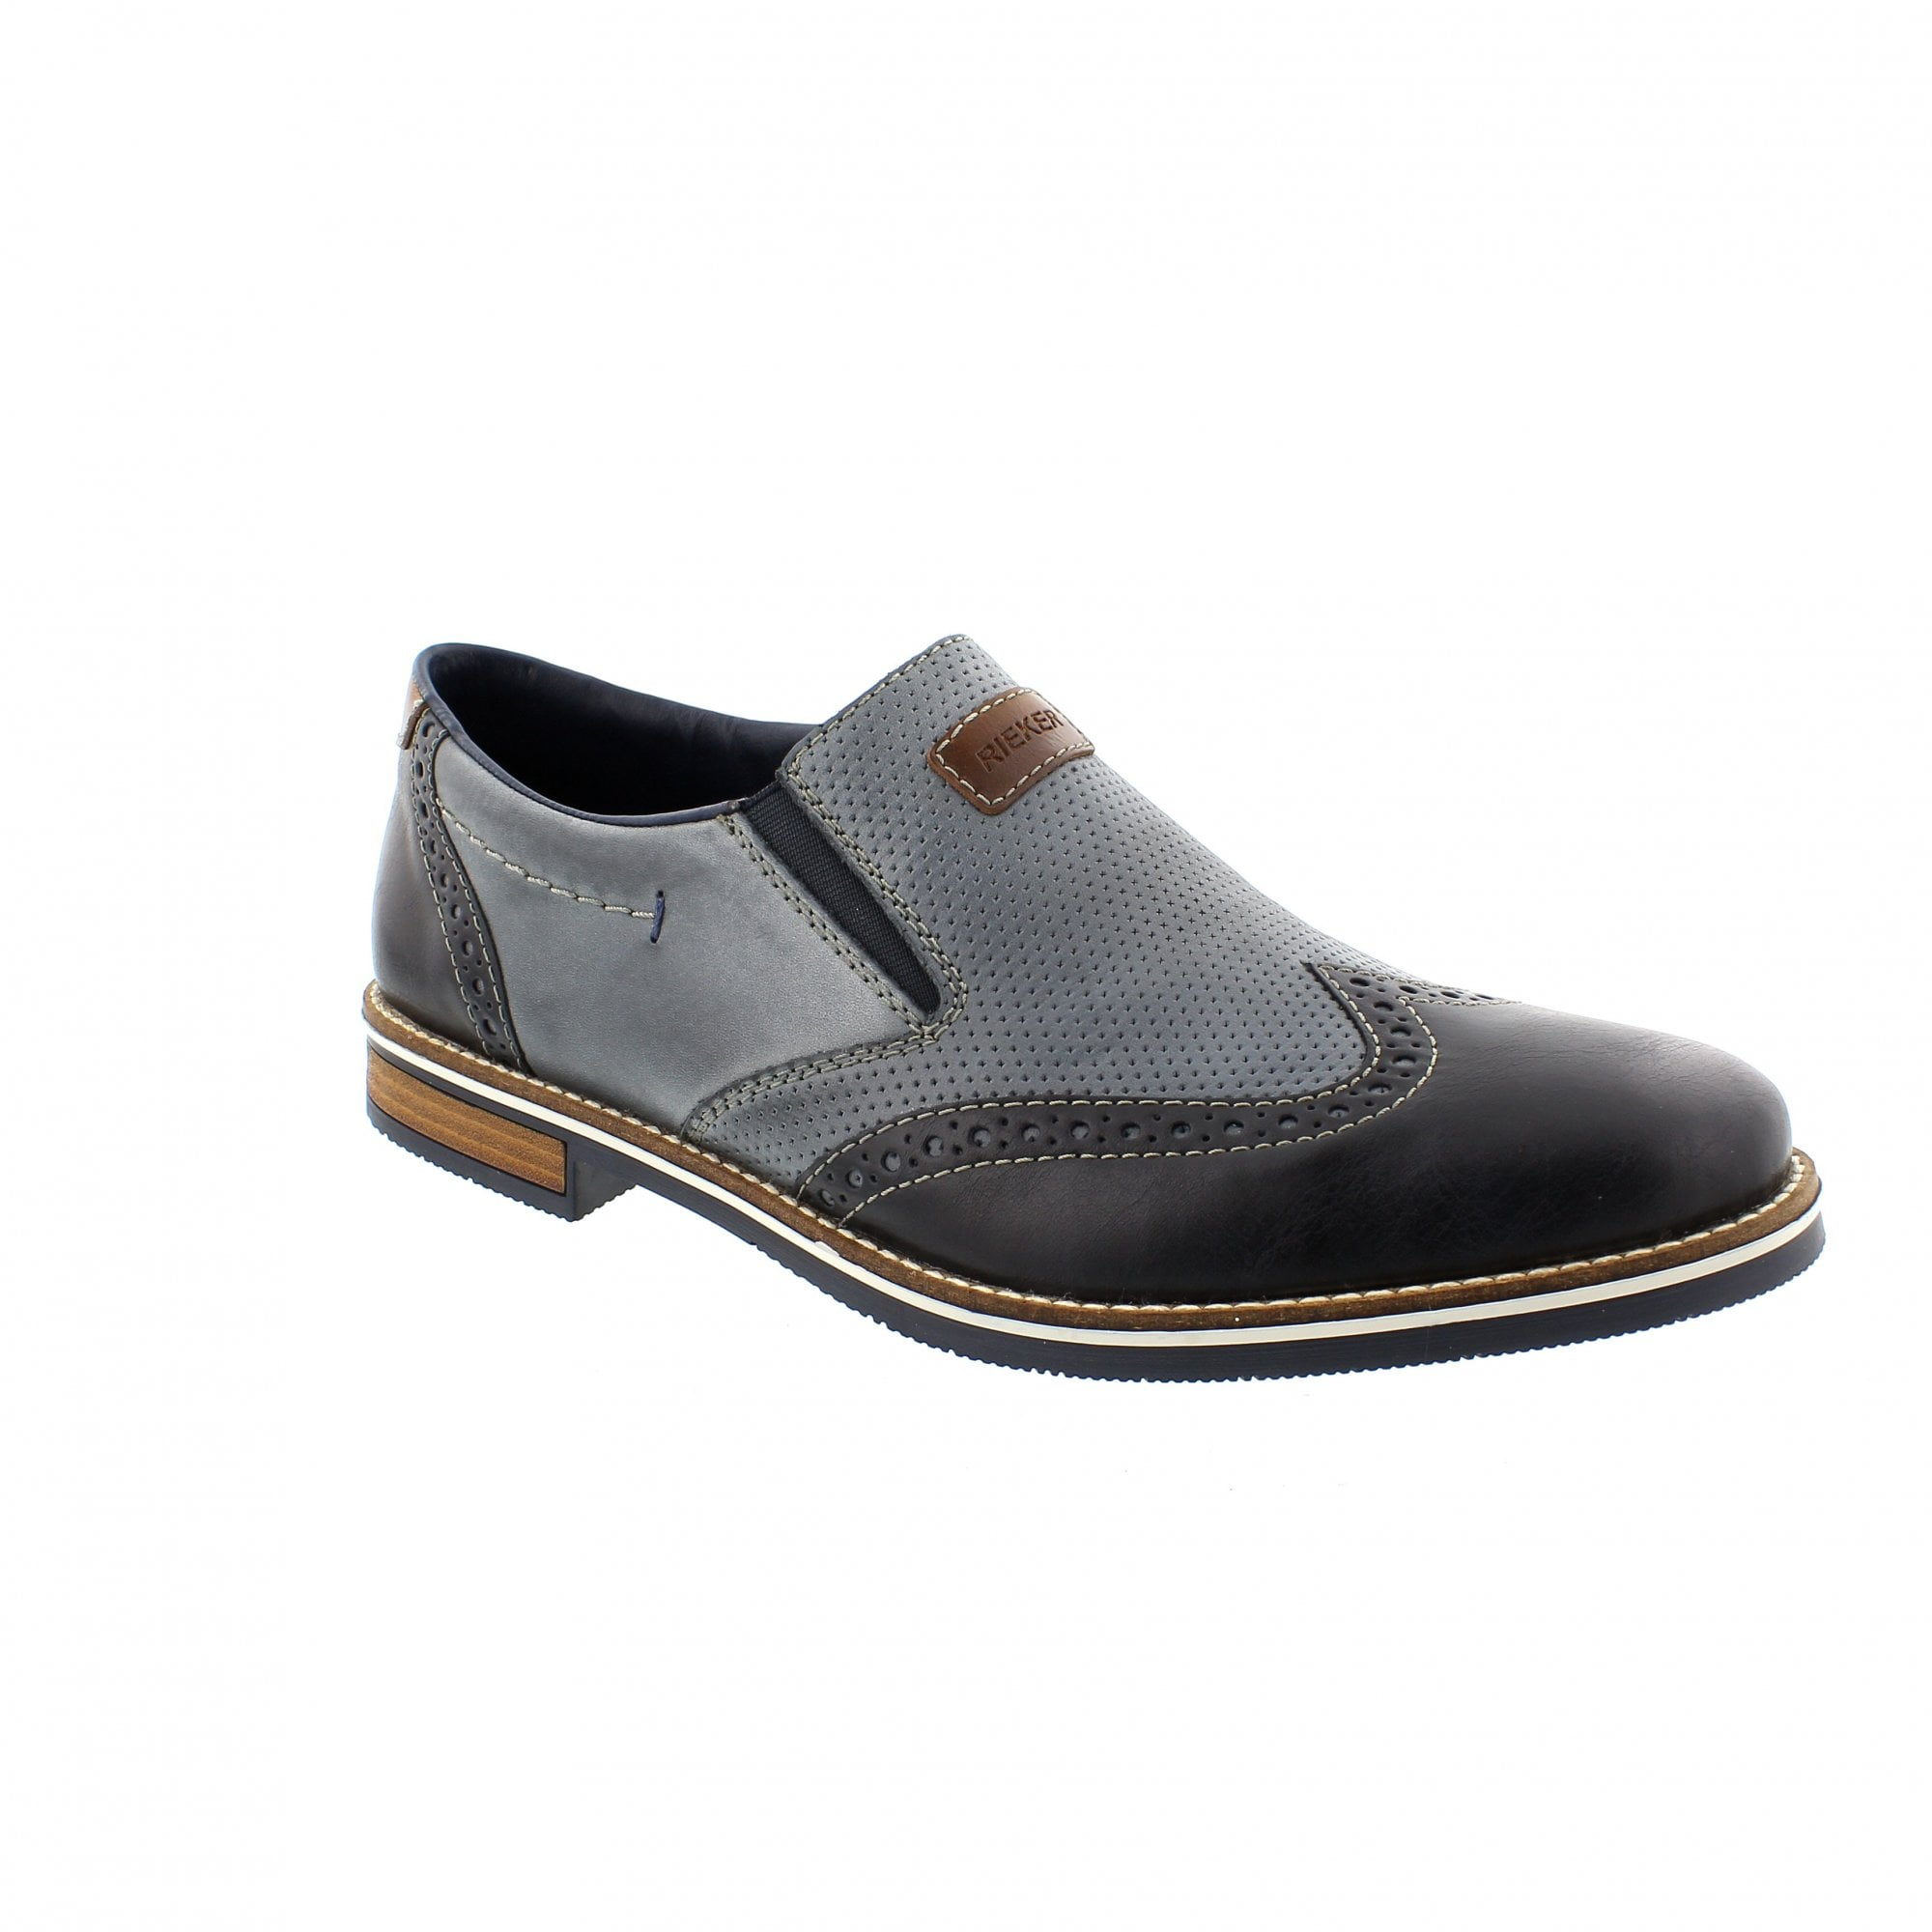 60a32d95b5 Rieker 13560-14 Navy Mens Slip On Shoes